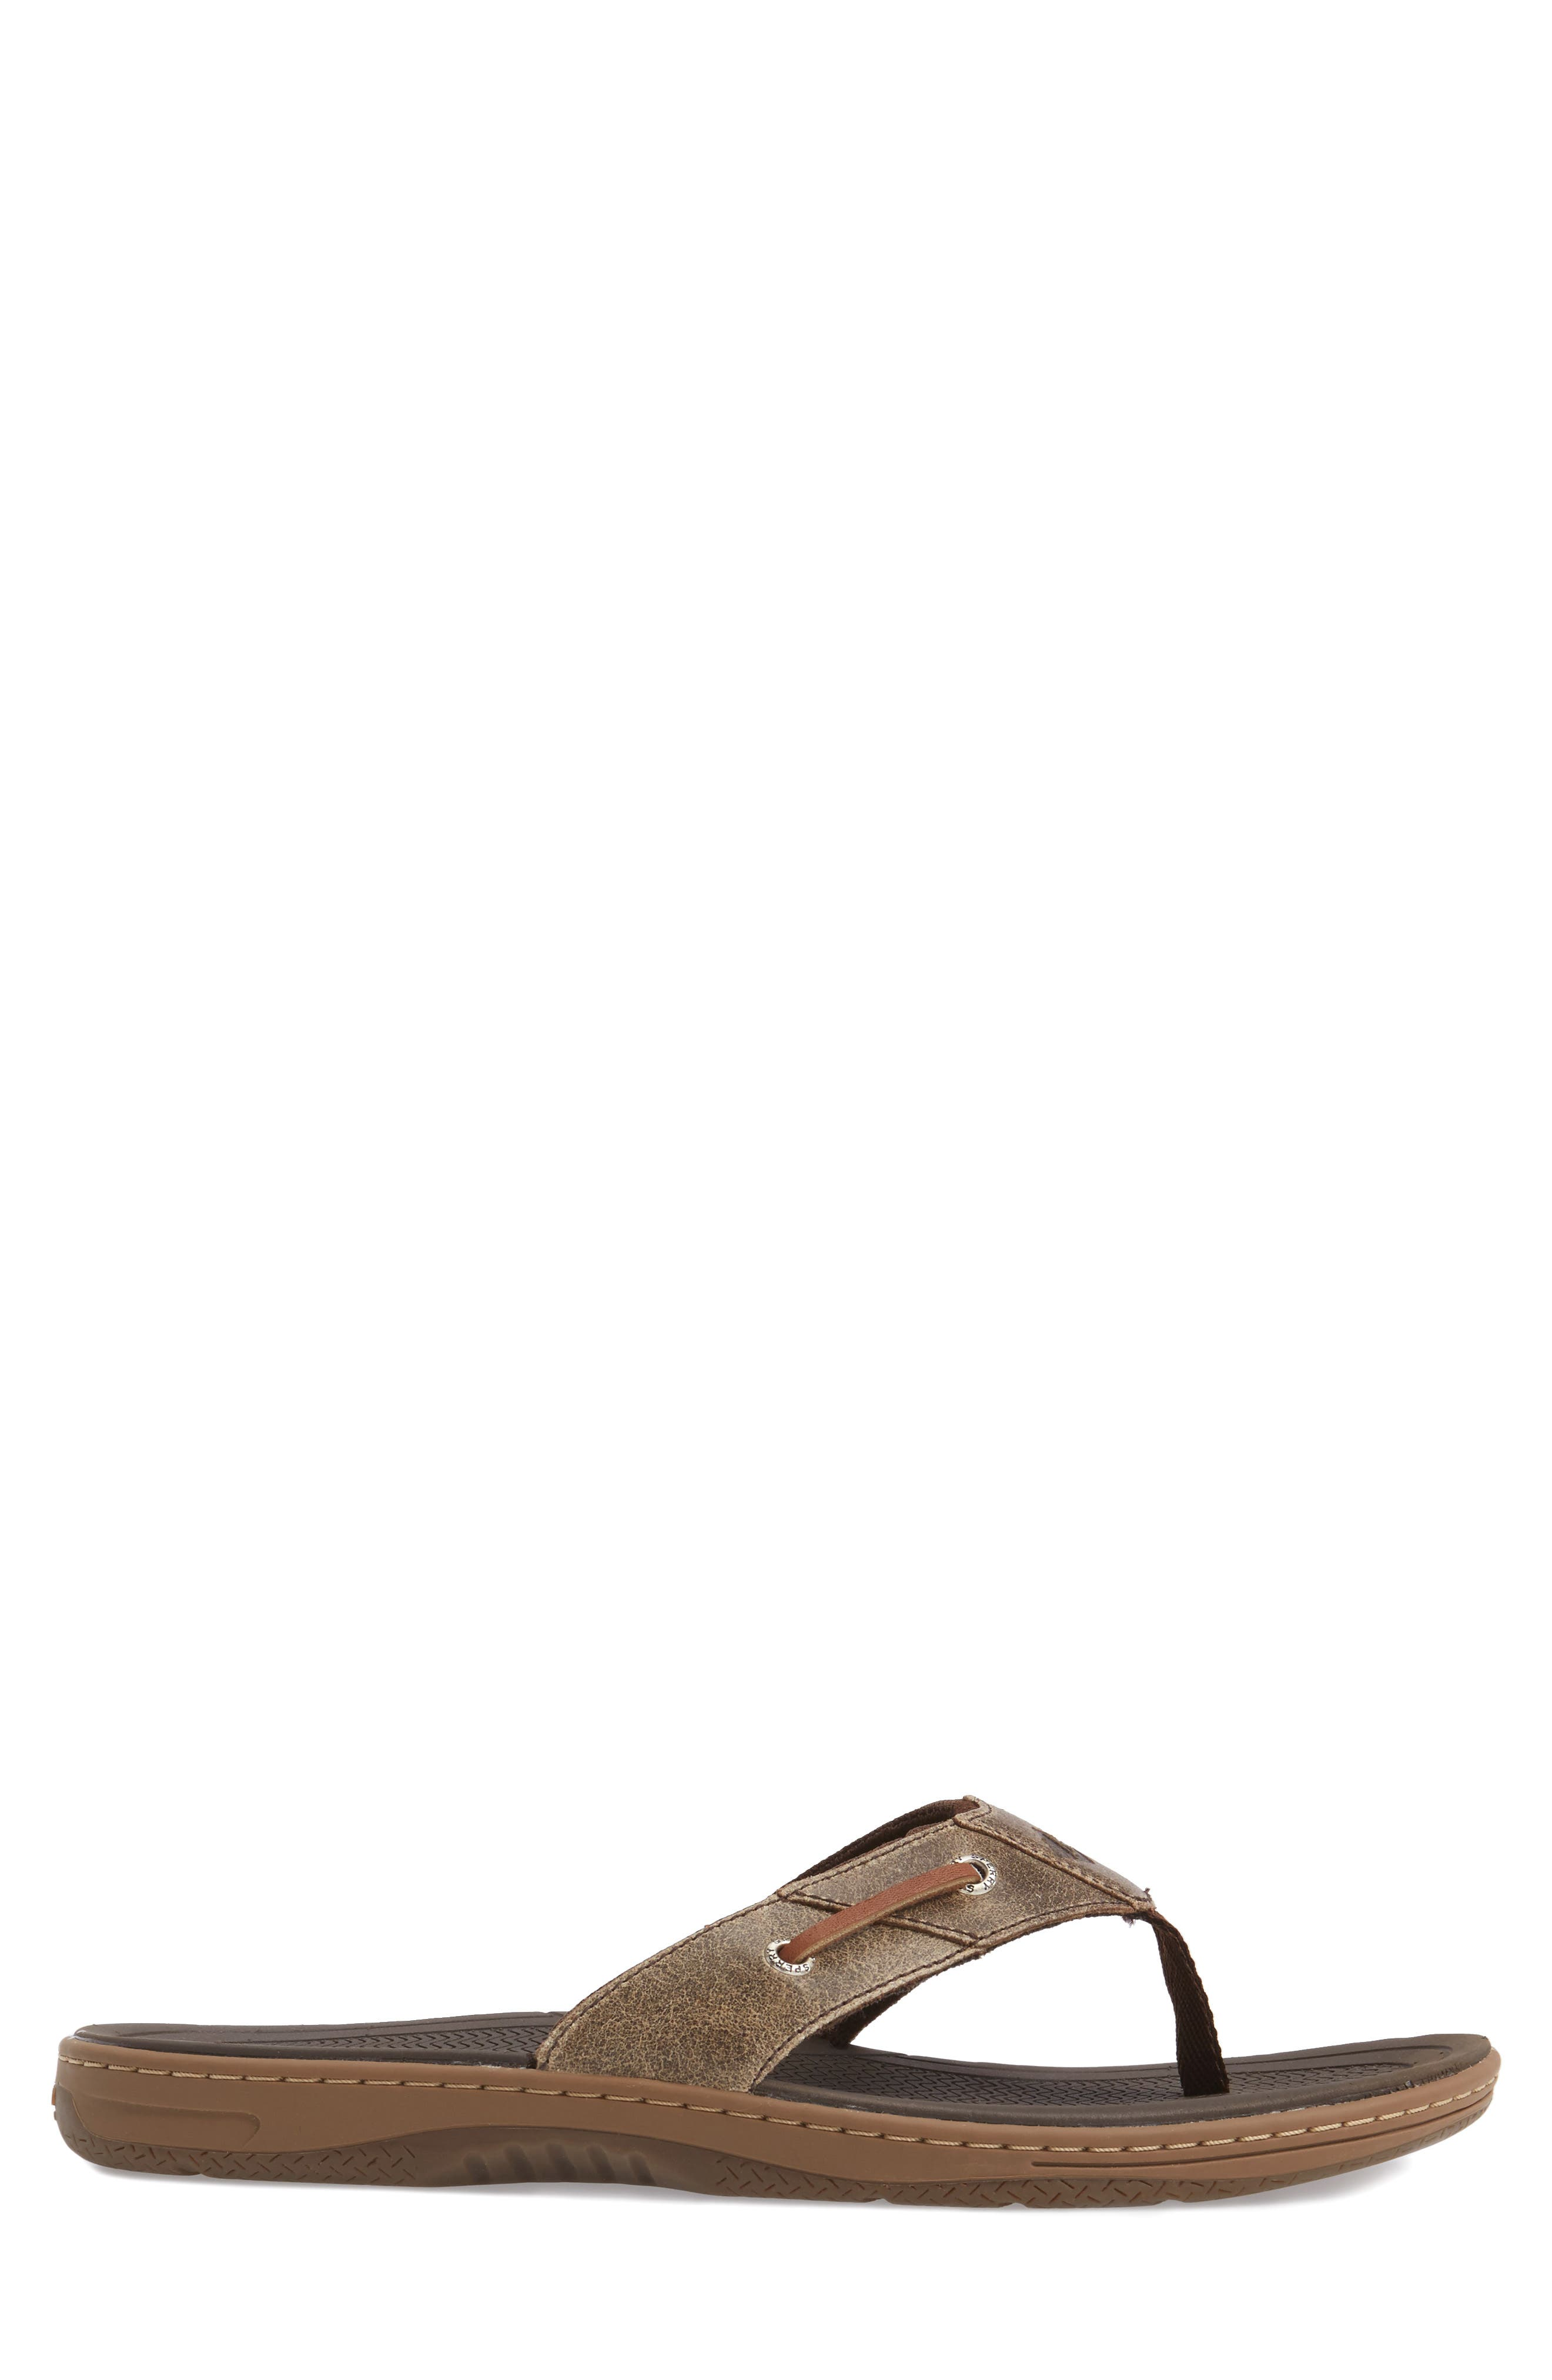 'Baitfish' Sandal,                             Alternate thumbnail 3, color,                             BROWN/BROWN